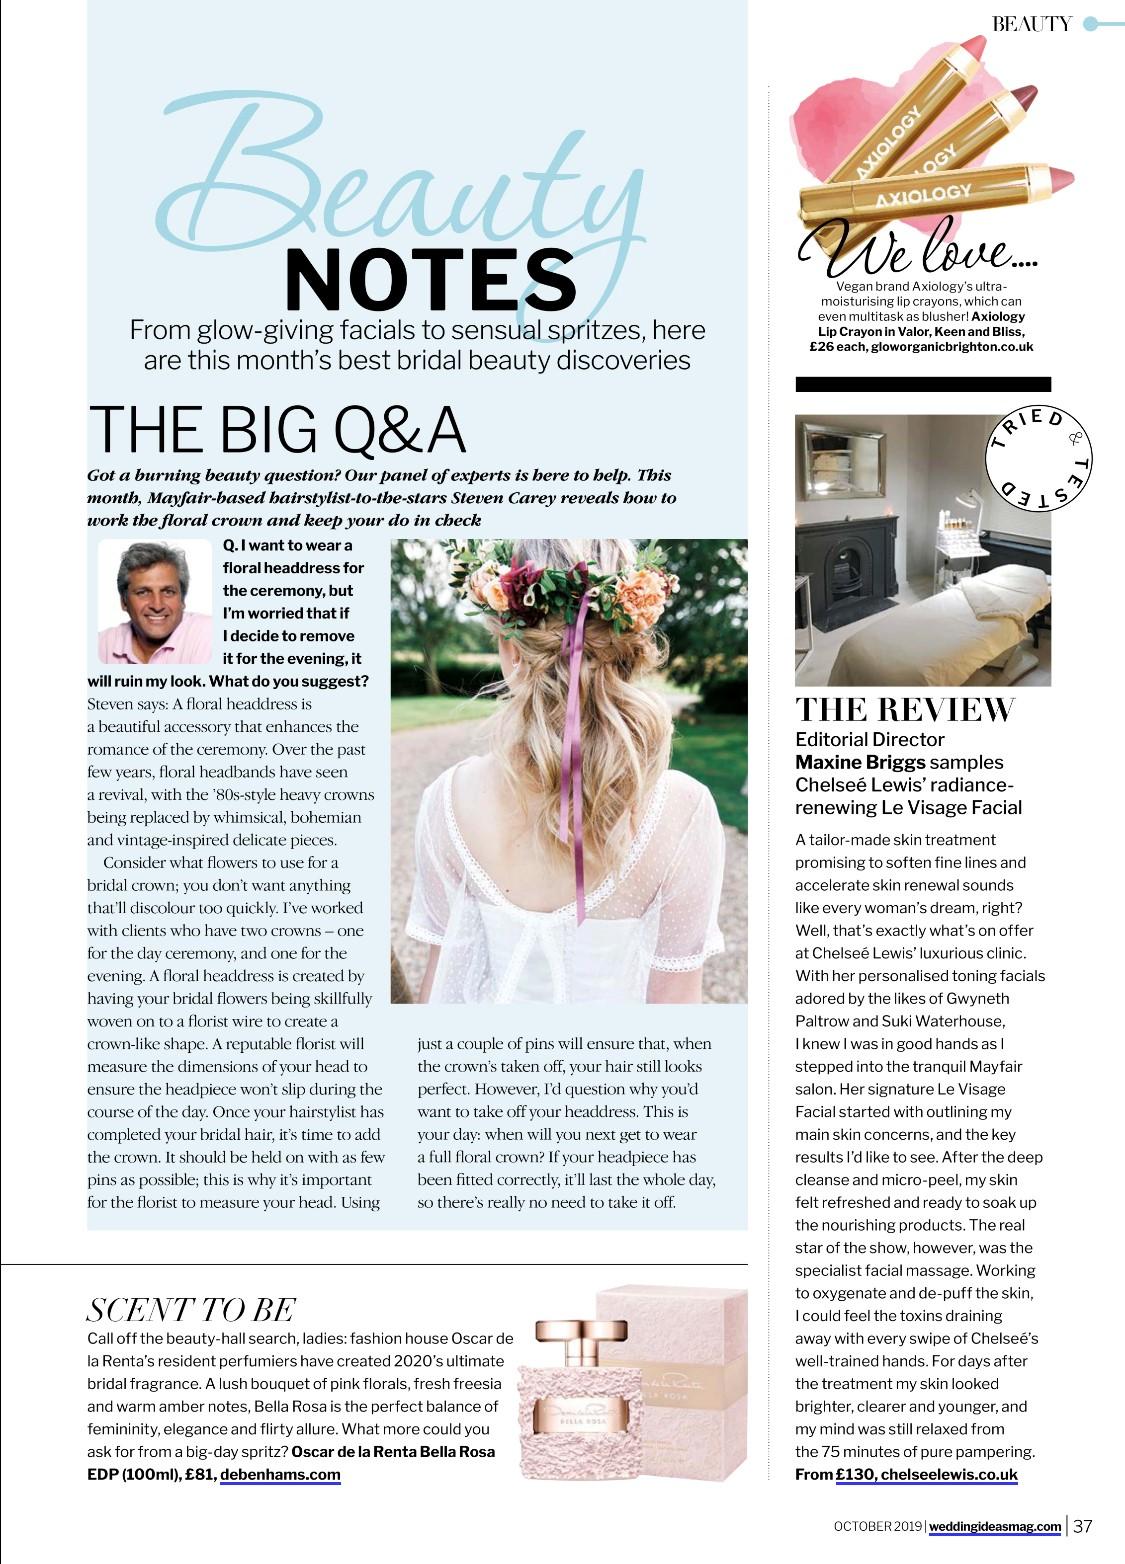 Wedding Ideas Magazine article